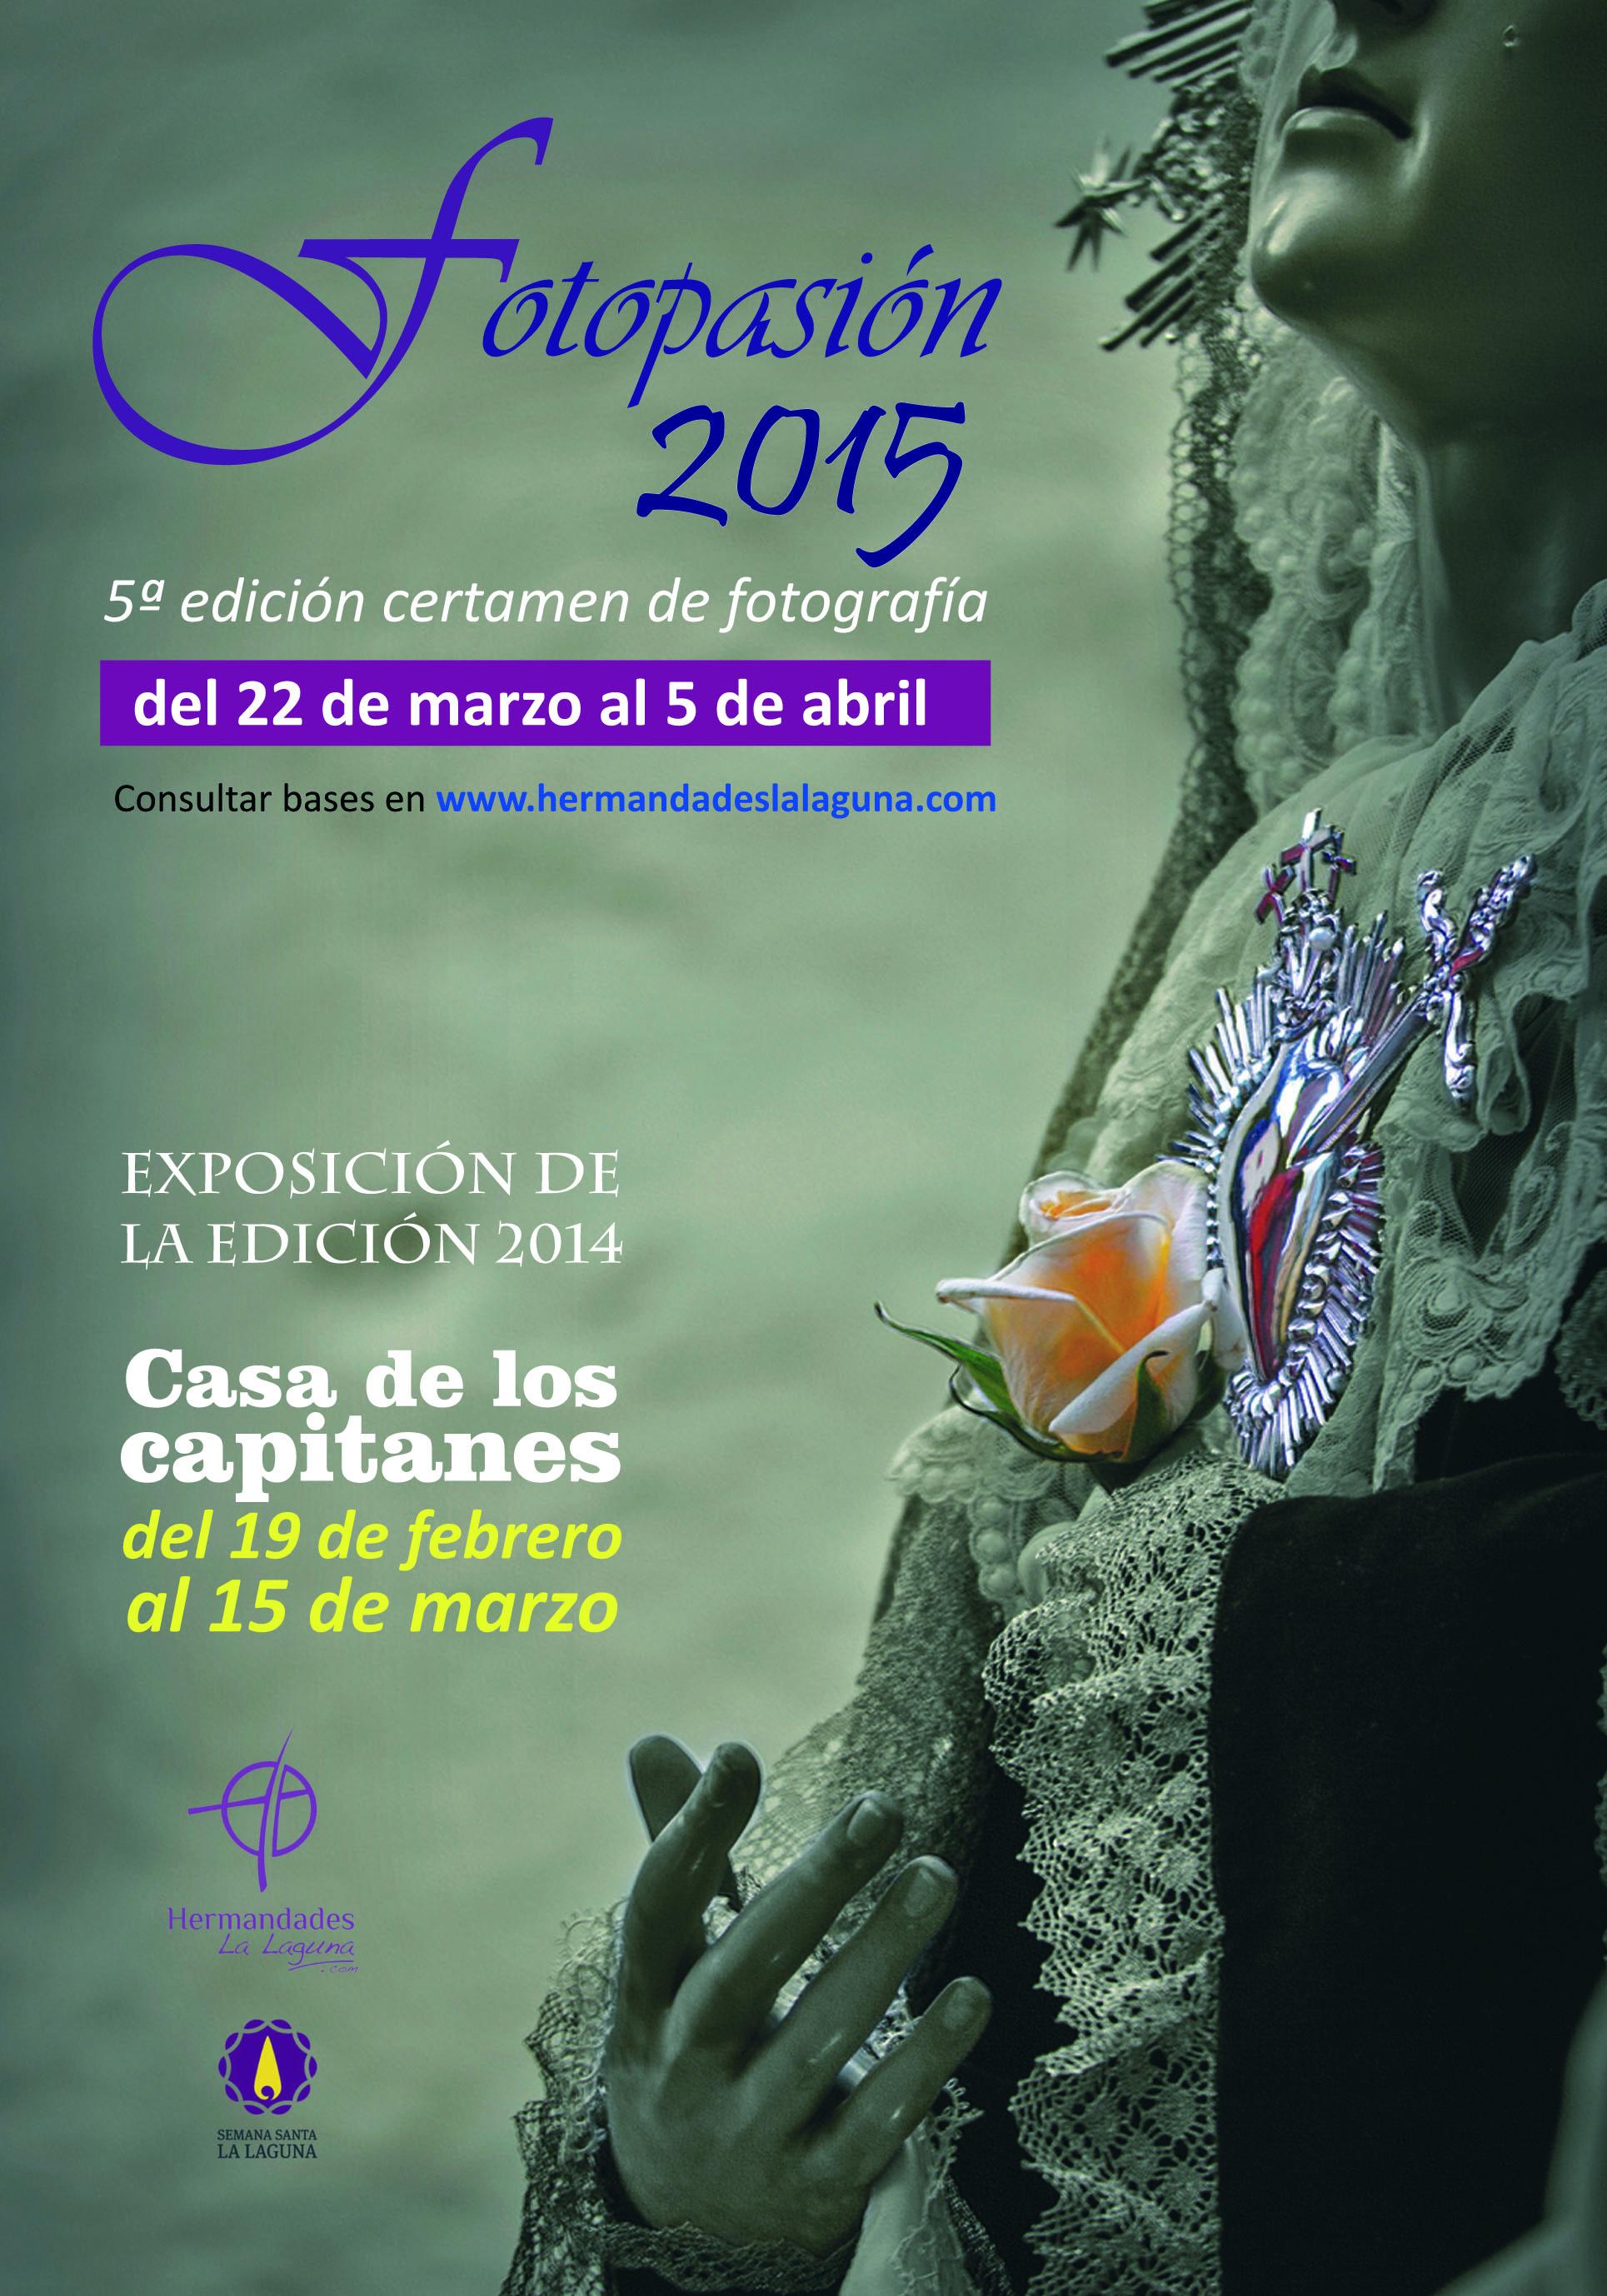 CARTEL FOTOPASION 2015